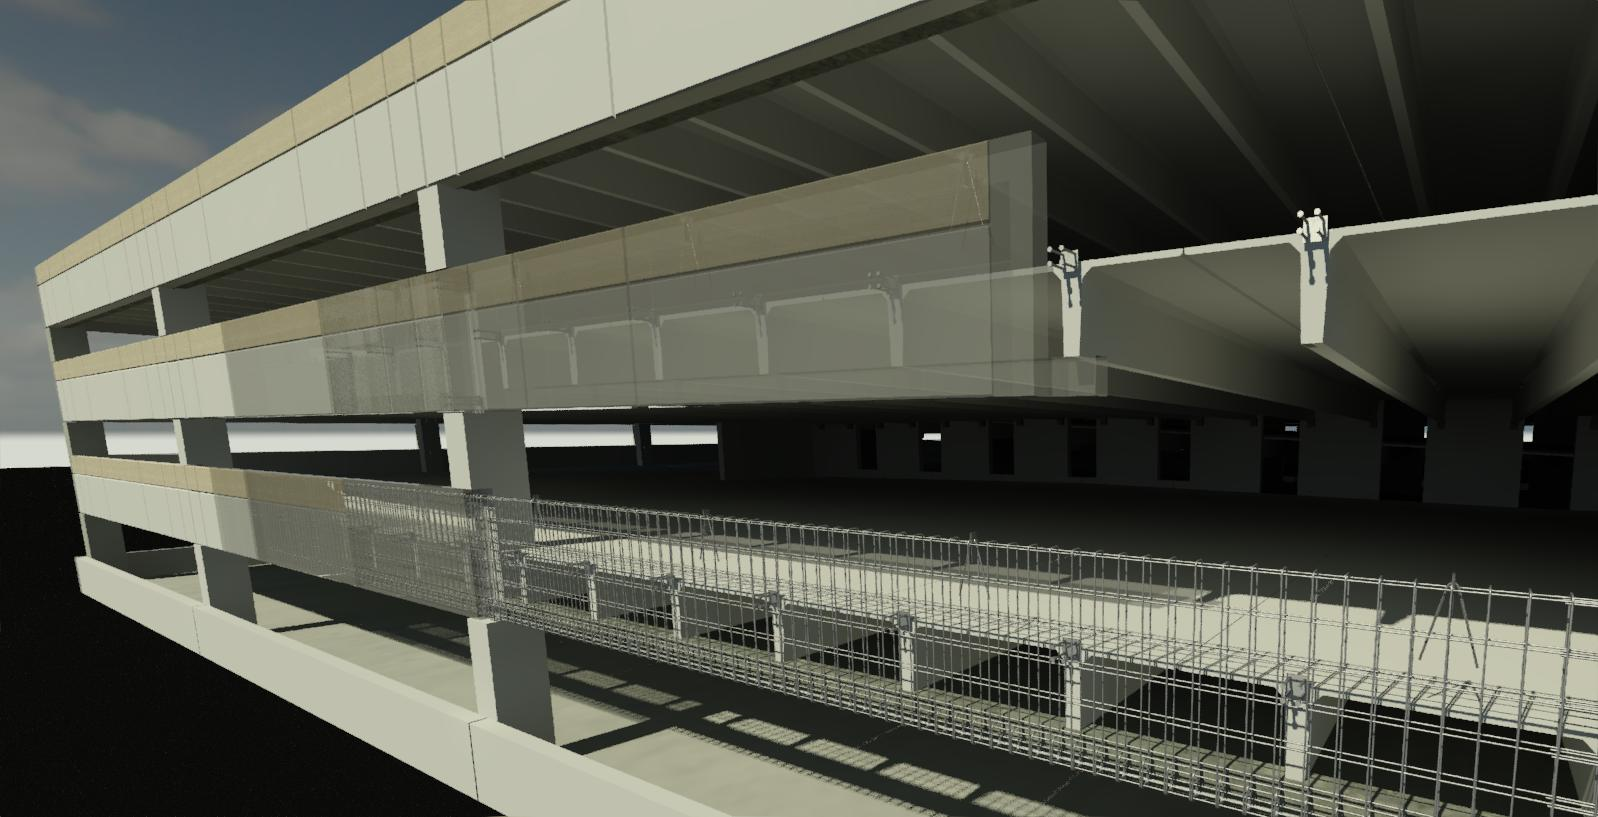 Parking Garage designed using AGACAD's Precast Concrete design software for Autodesk Revit